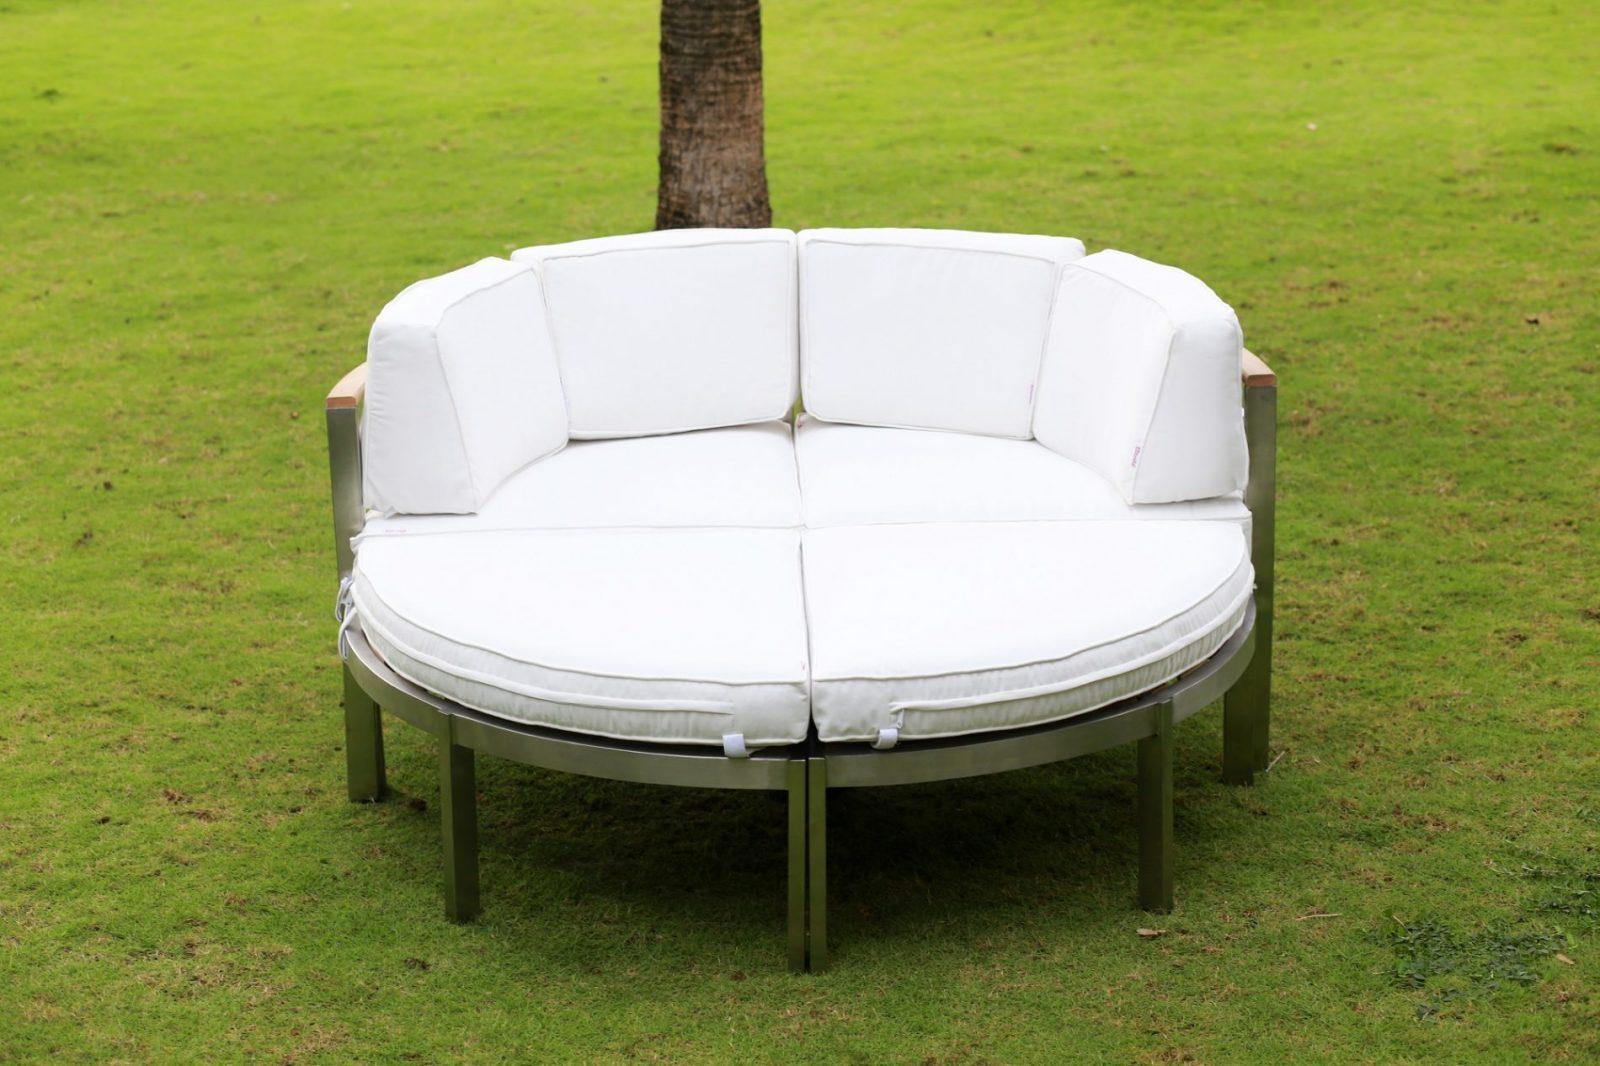 Indonesia Teak Garden Furniture, Outdoor Furniture, and Patio Furniture